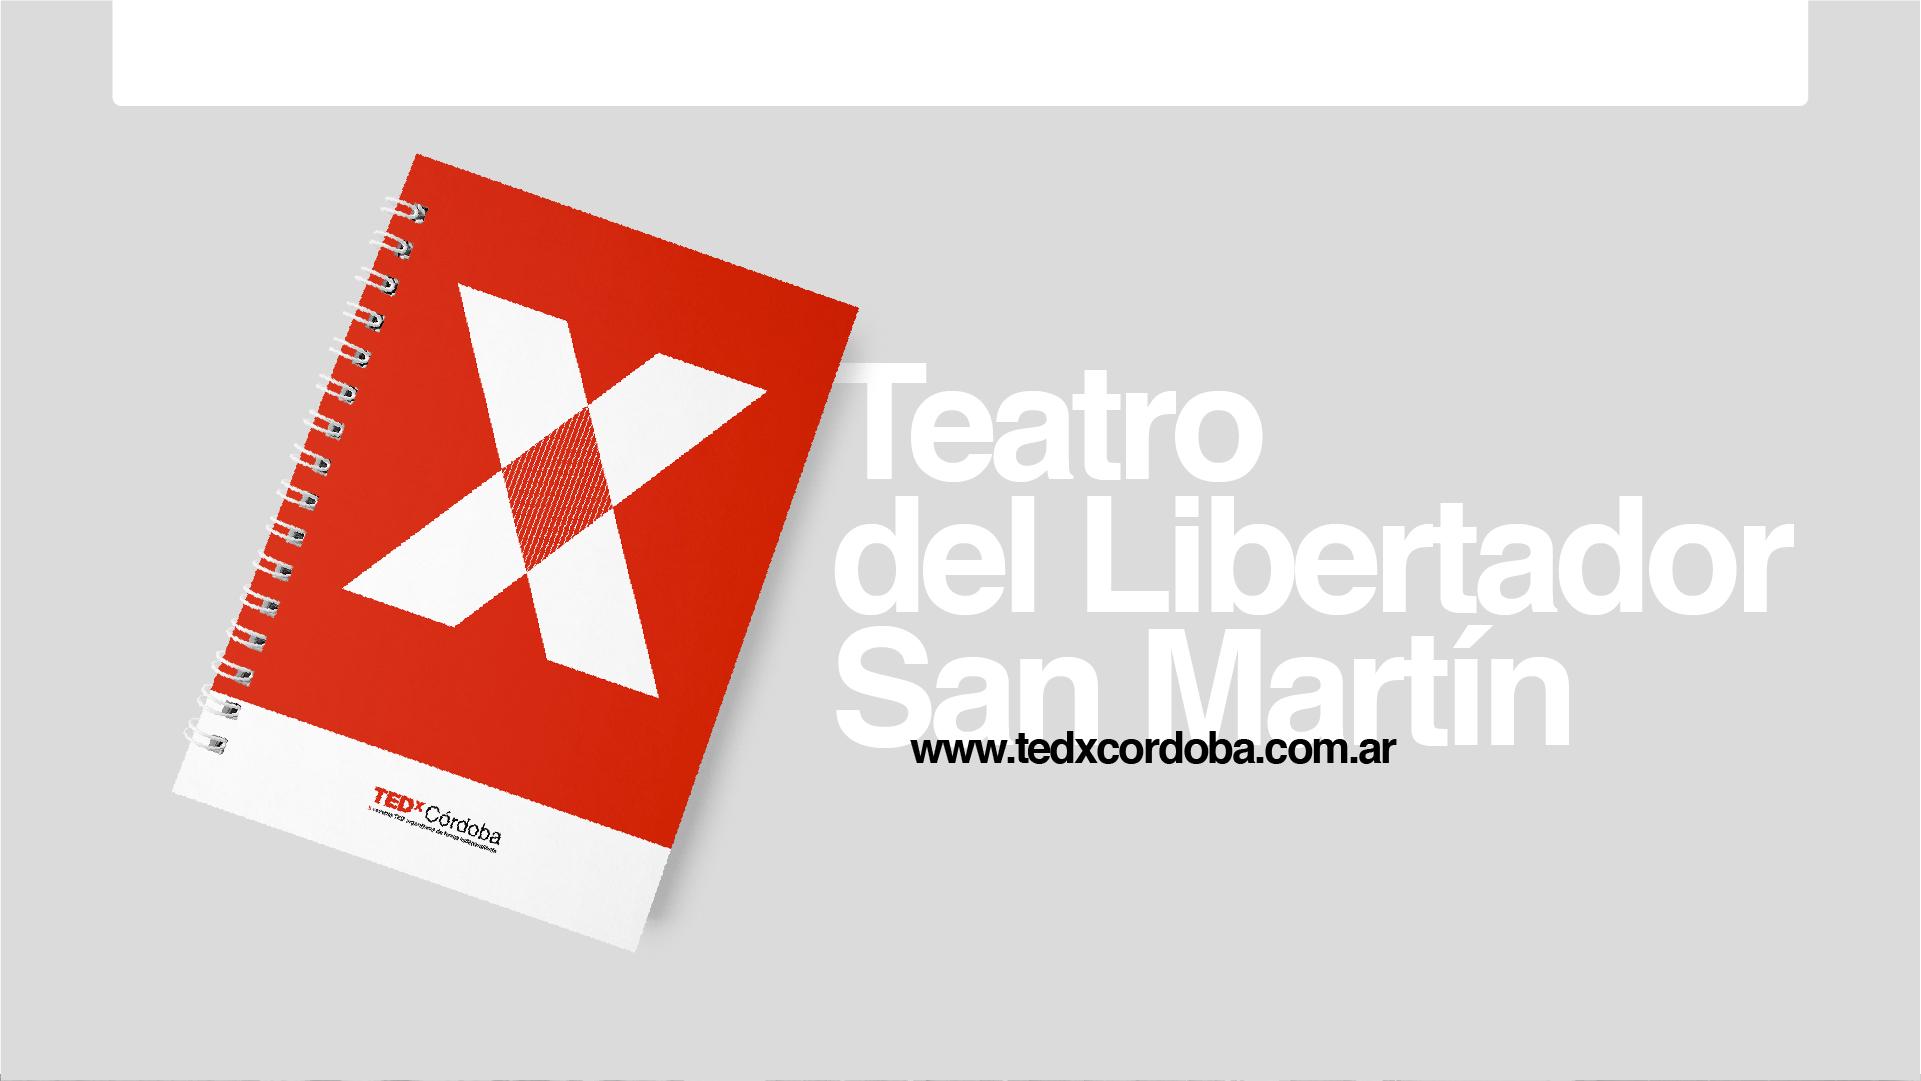 TEDx Cordoba teatro del liberador san martin